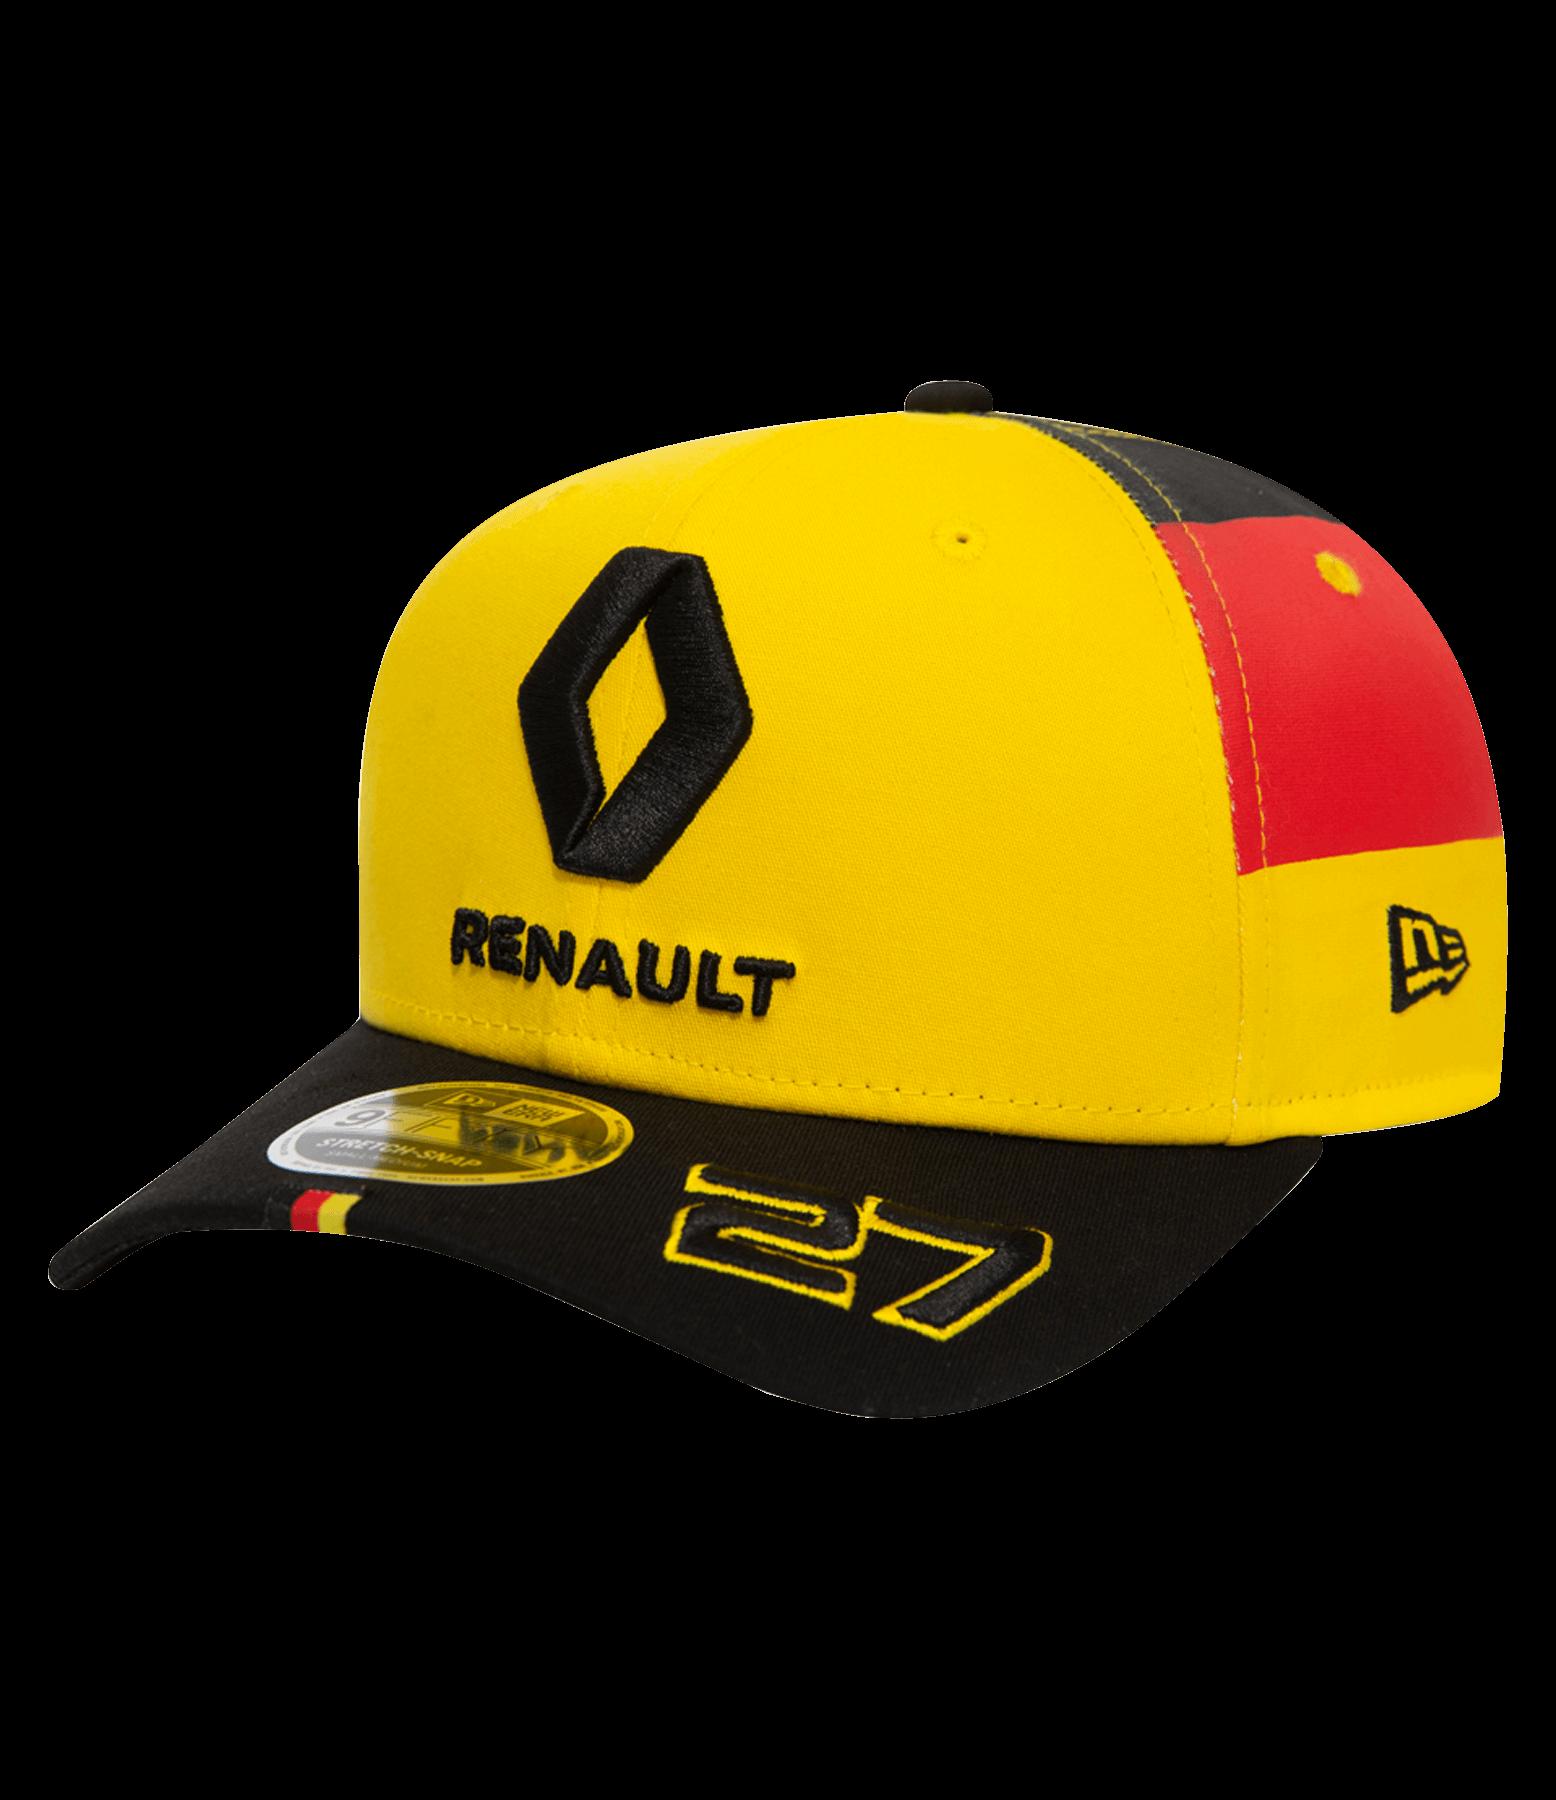 Nico Hülkenberg 2019 official cap - German GP special edition